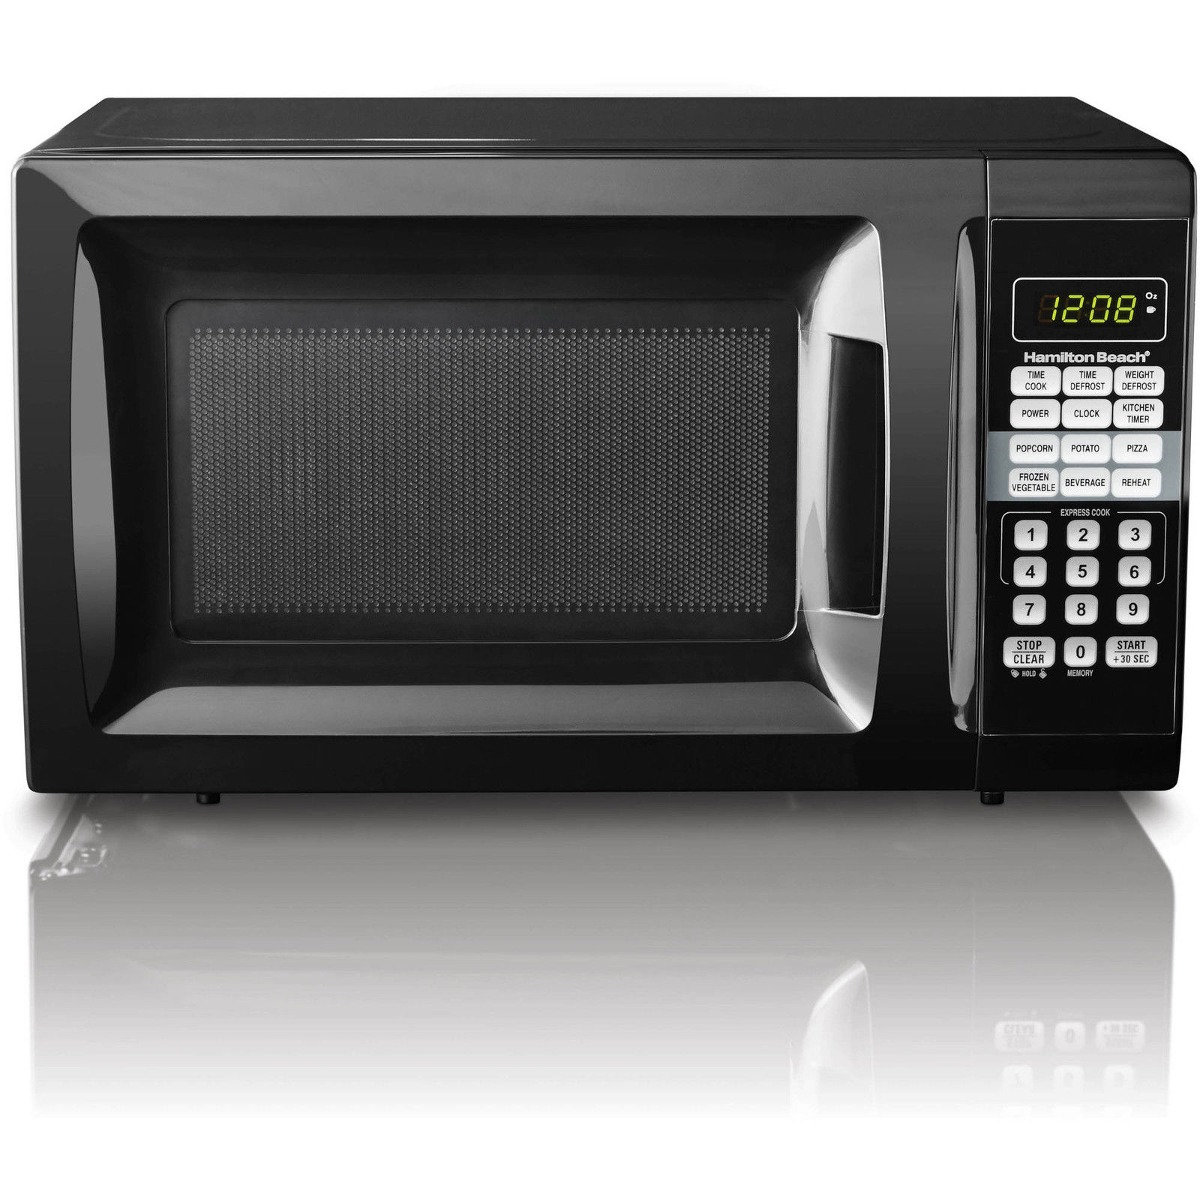 Microondas Mainstays 0 7cu Ft 700w Negro Reacondicionado